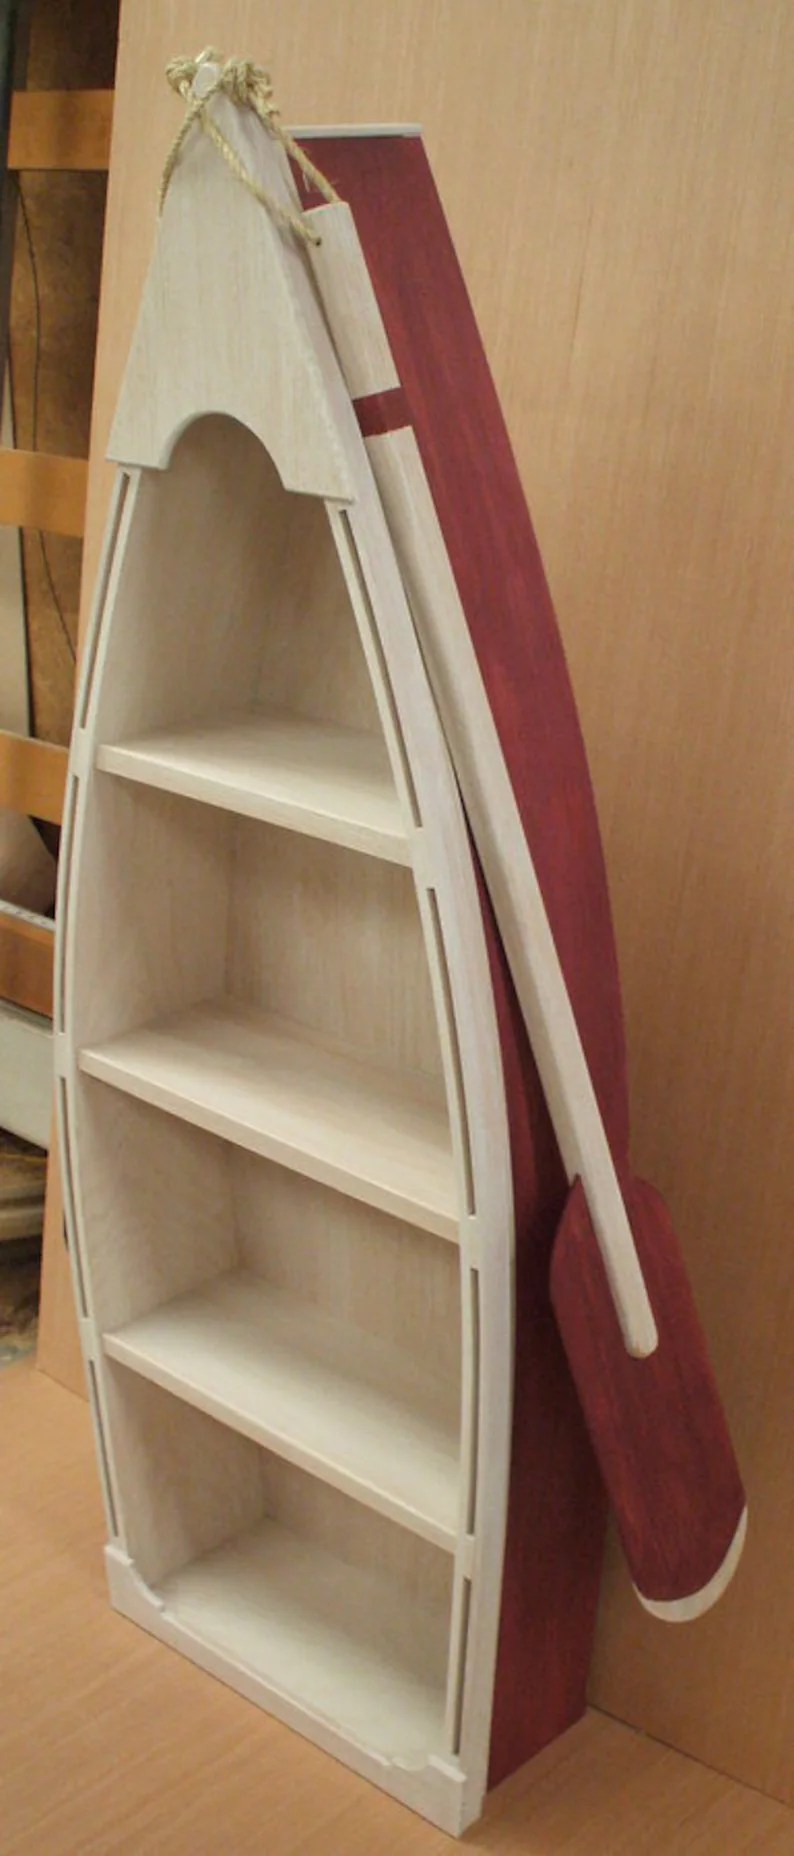 5 Foot Red Row Boat Bookshelf Shelf Bookcase Shelves Skiff Schooner Dory Canoe Nautical Man Cave Wooden Boat